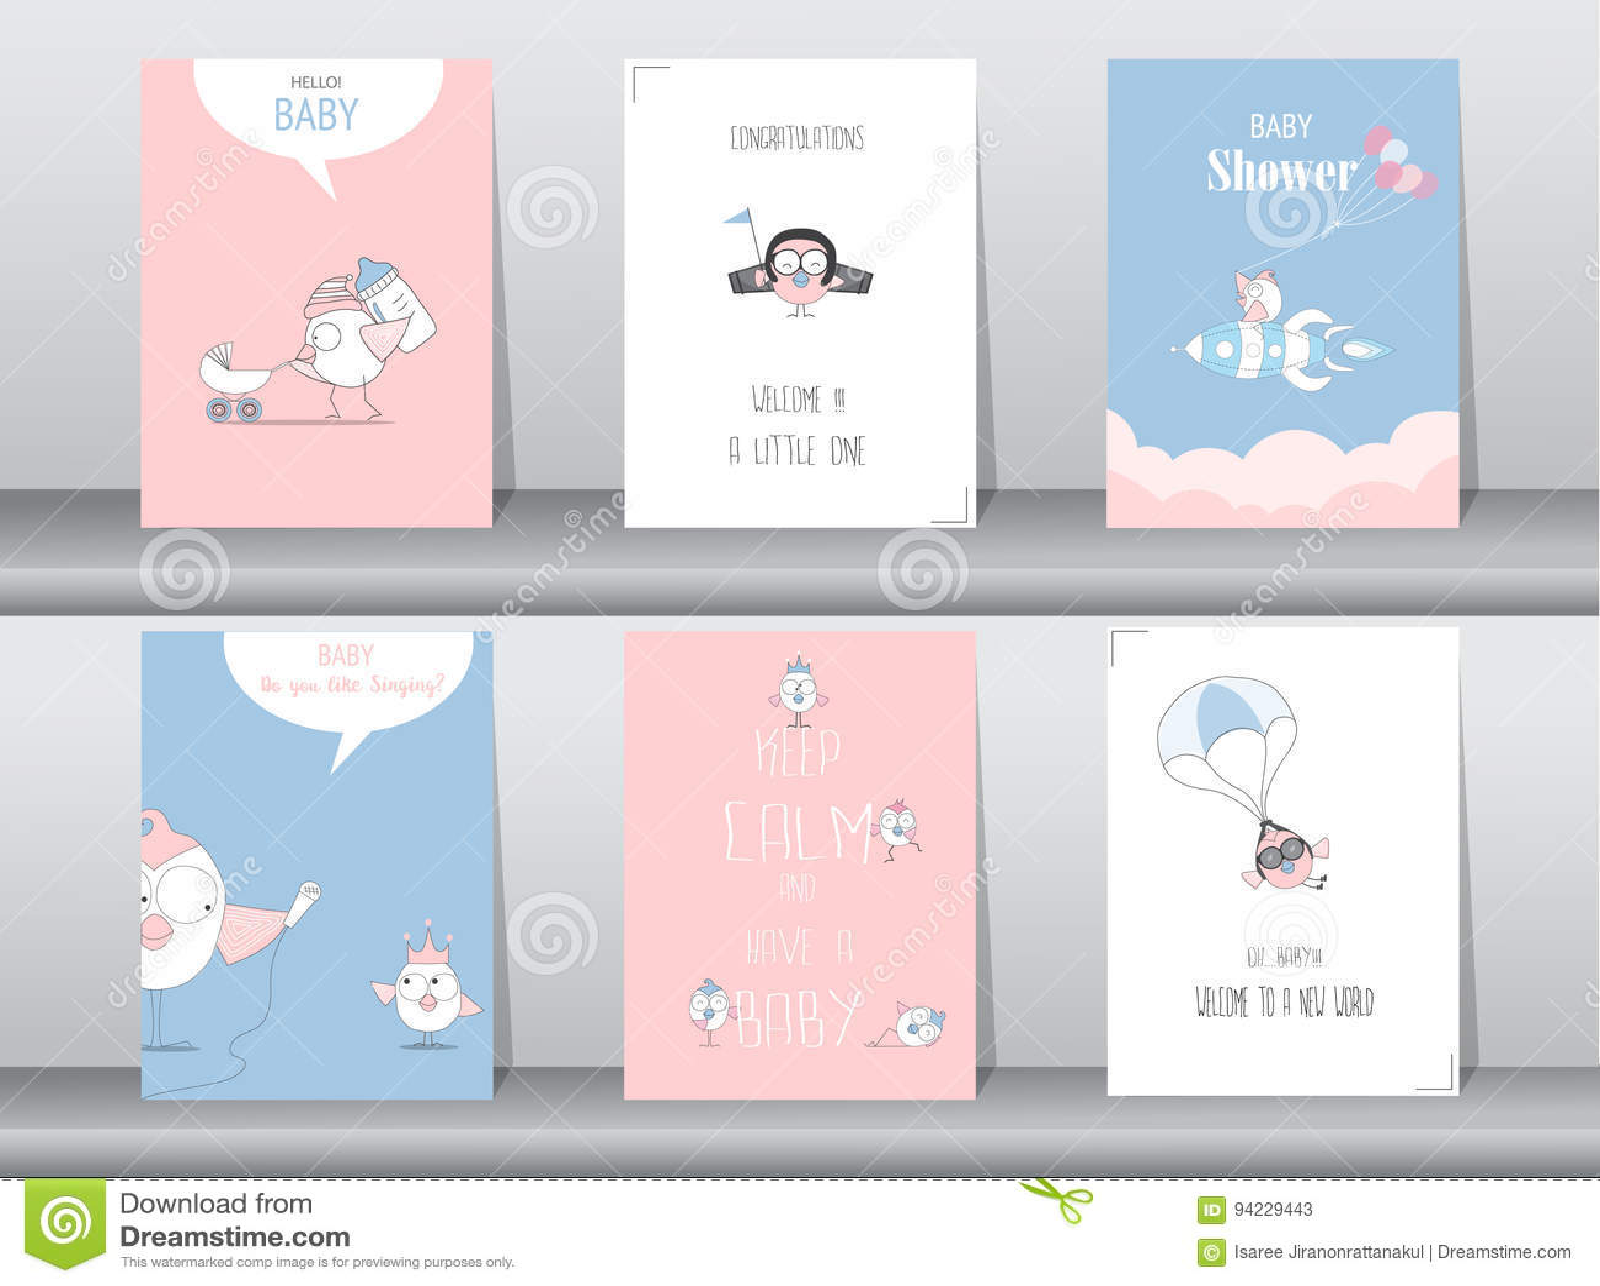 Set of baby shower invitation cardsbirthdaypostertemplate download set of baby shower invitation cardsbirthdaypostertemplate greeting maxwellsz